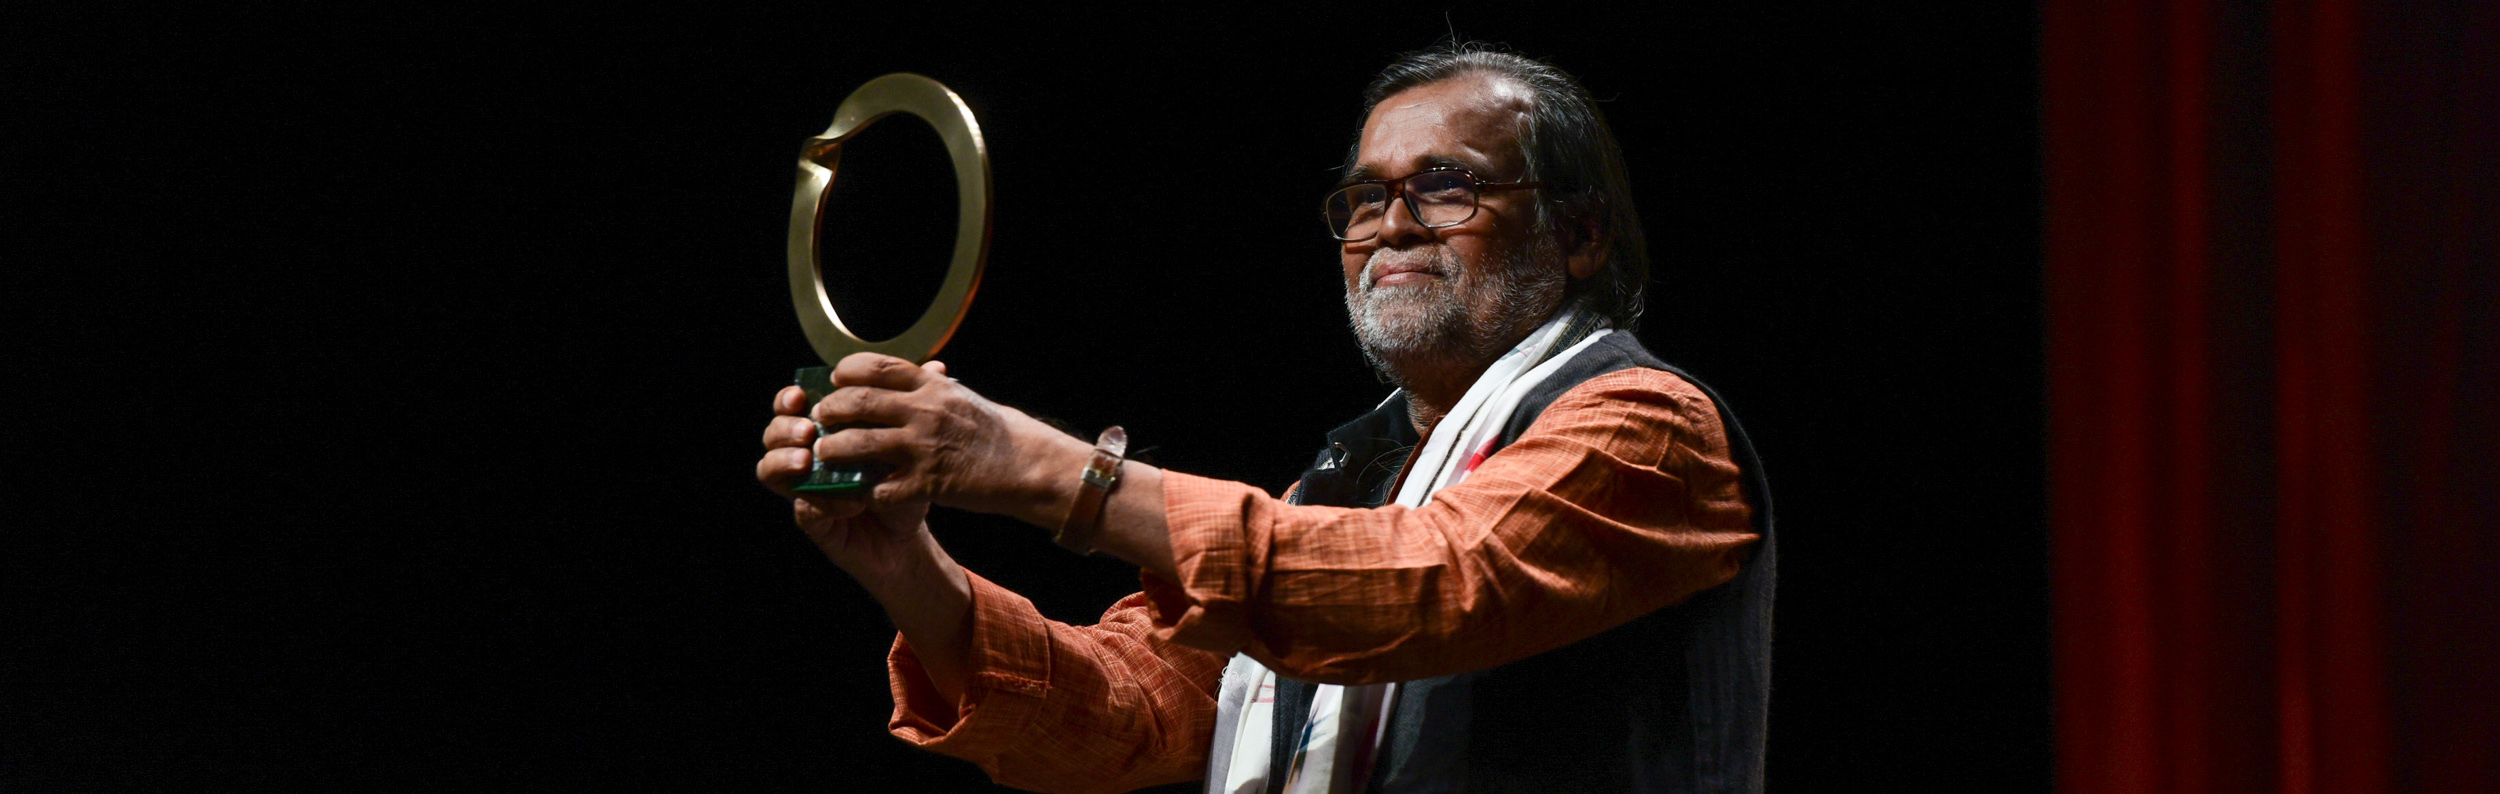 Interview: Prafulla Samantara, Winner of the 2017 'Green Nobel'